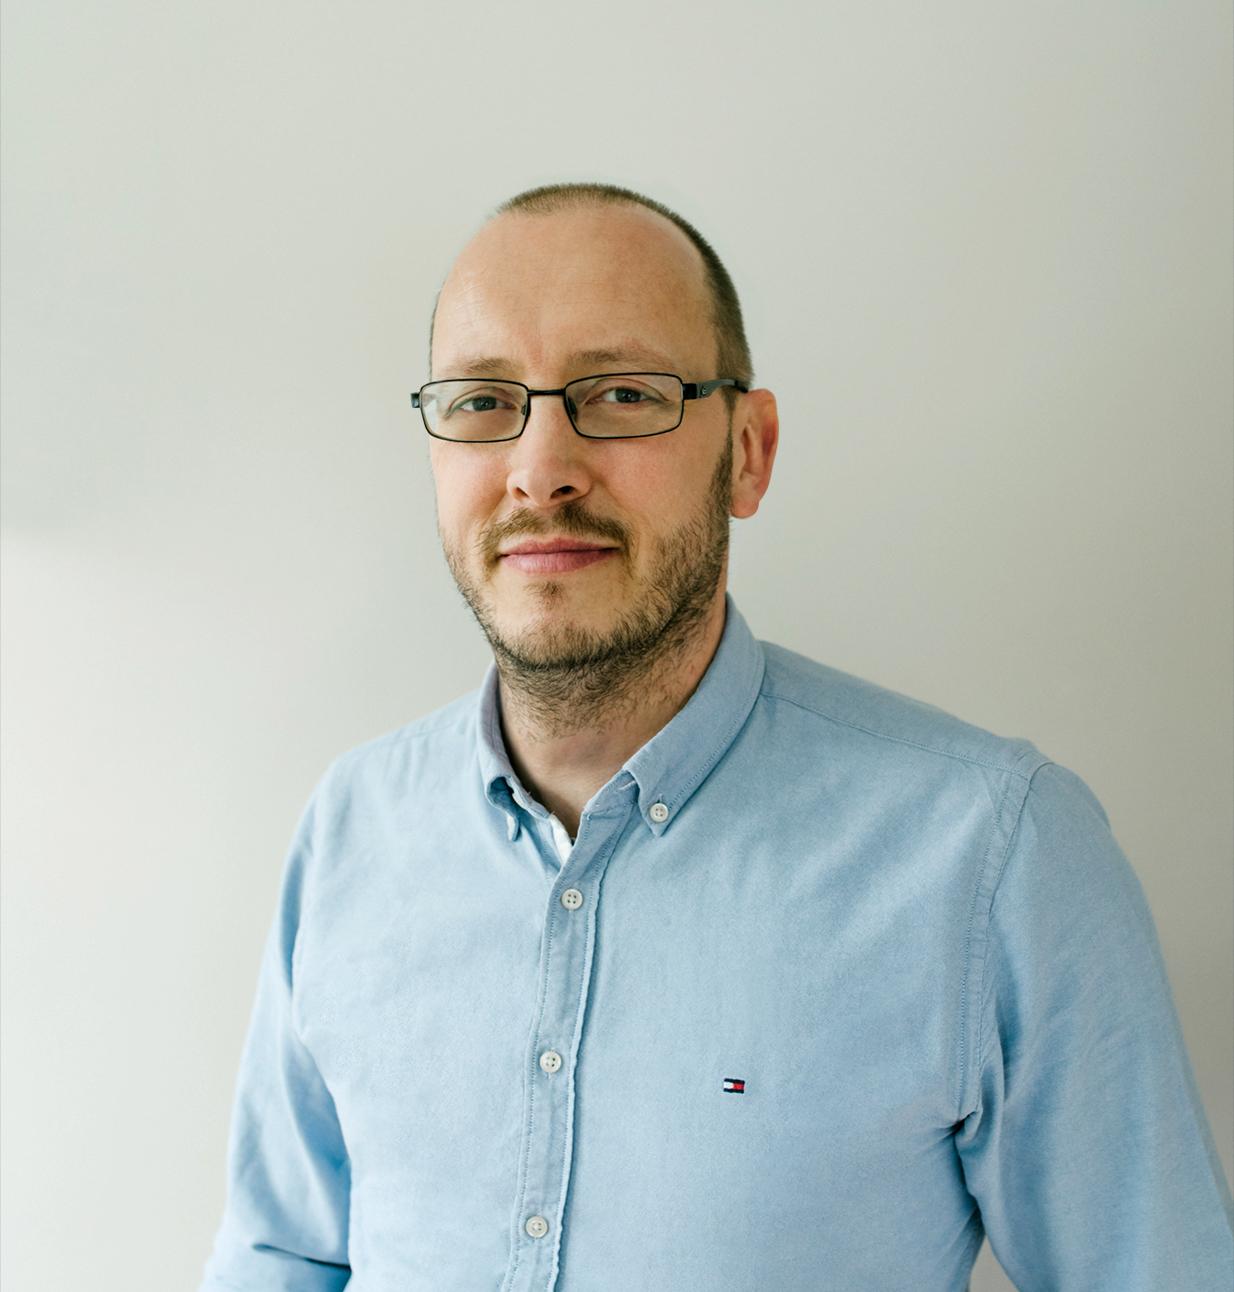 ALEX WALTER – Director